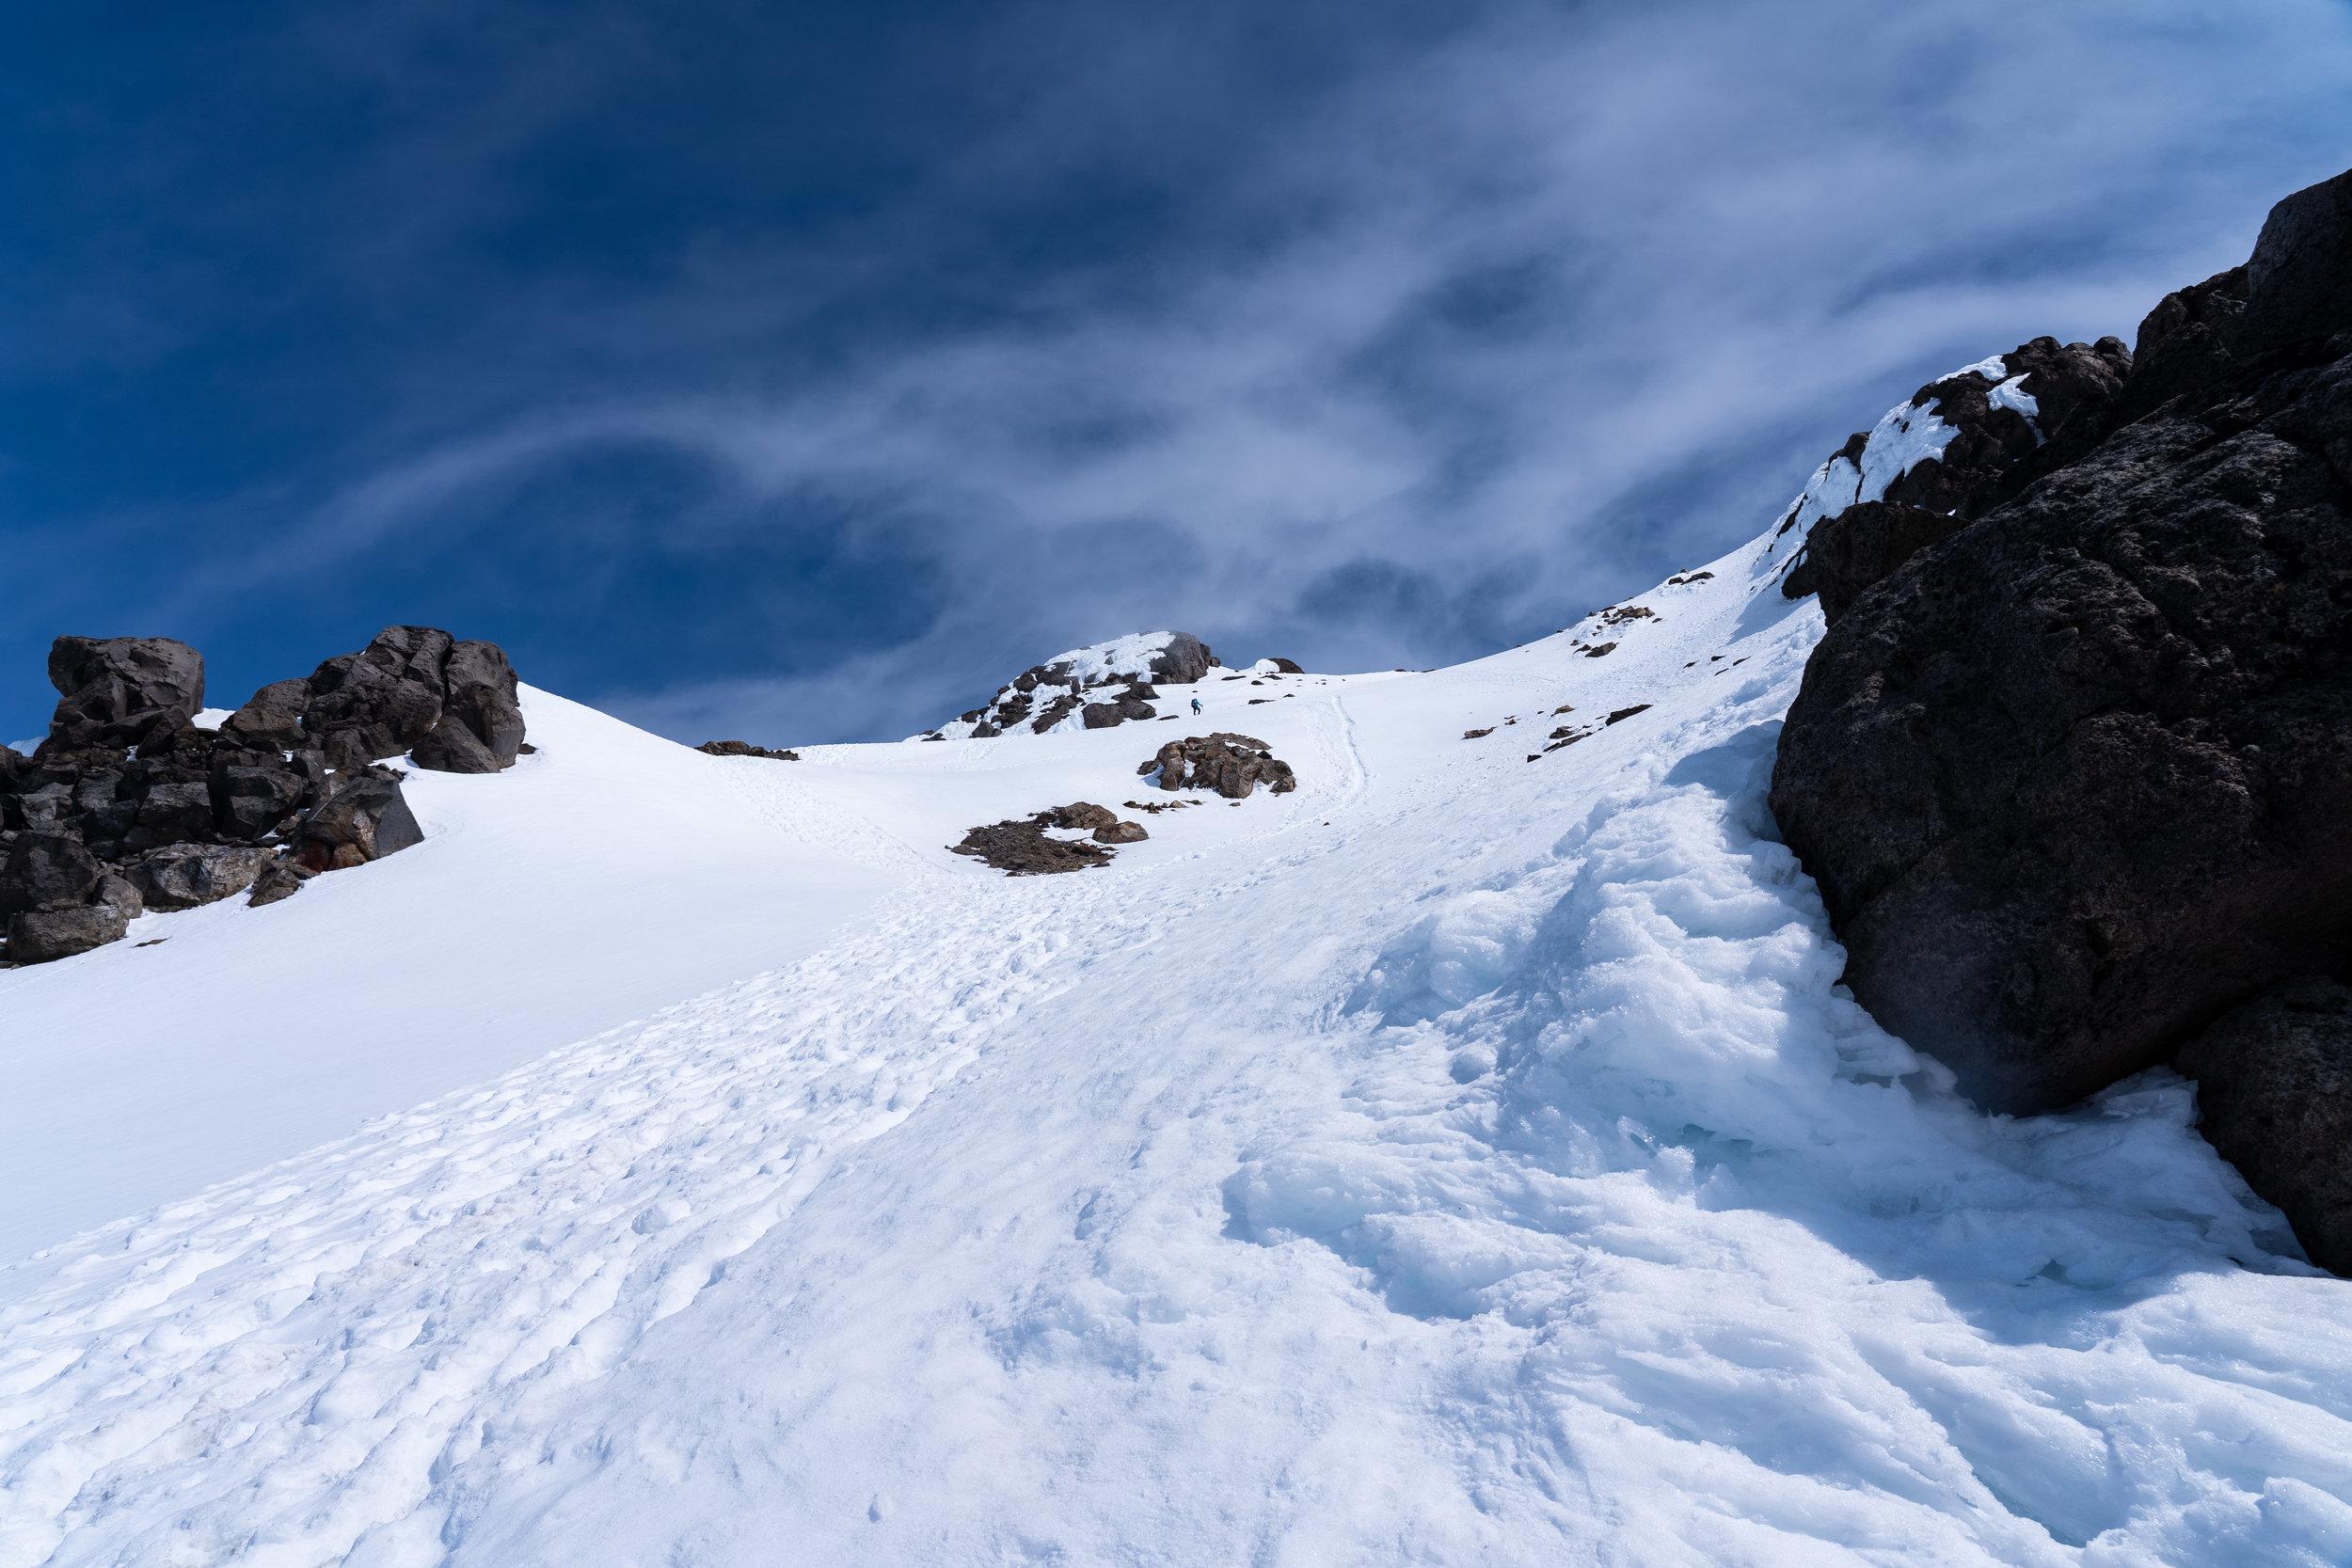 Final snow climb